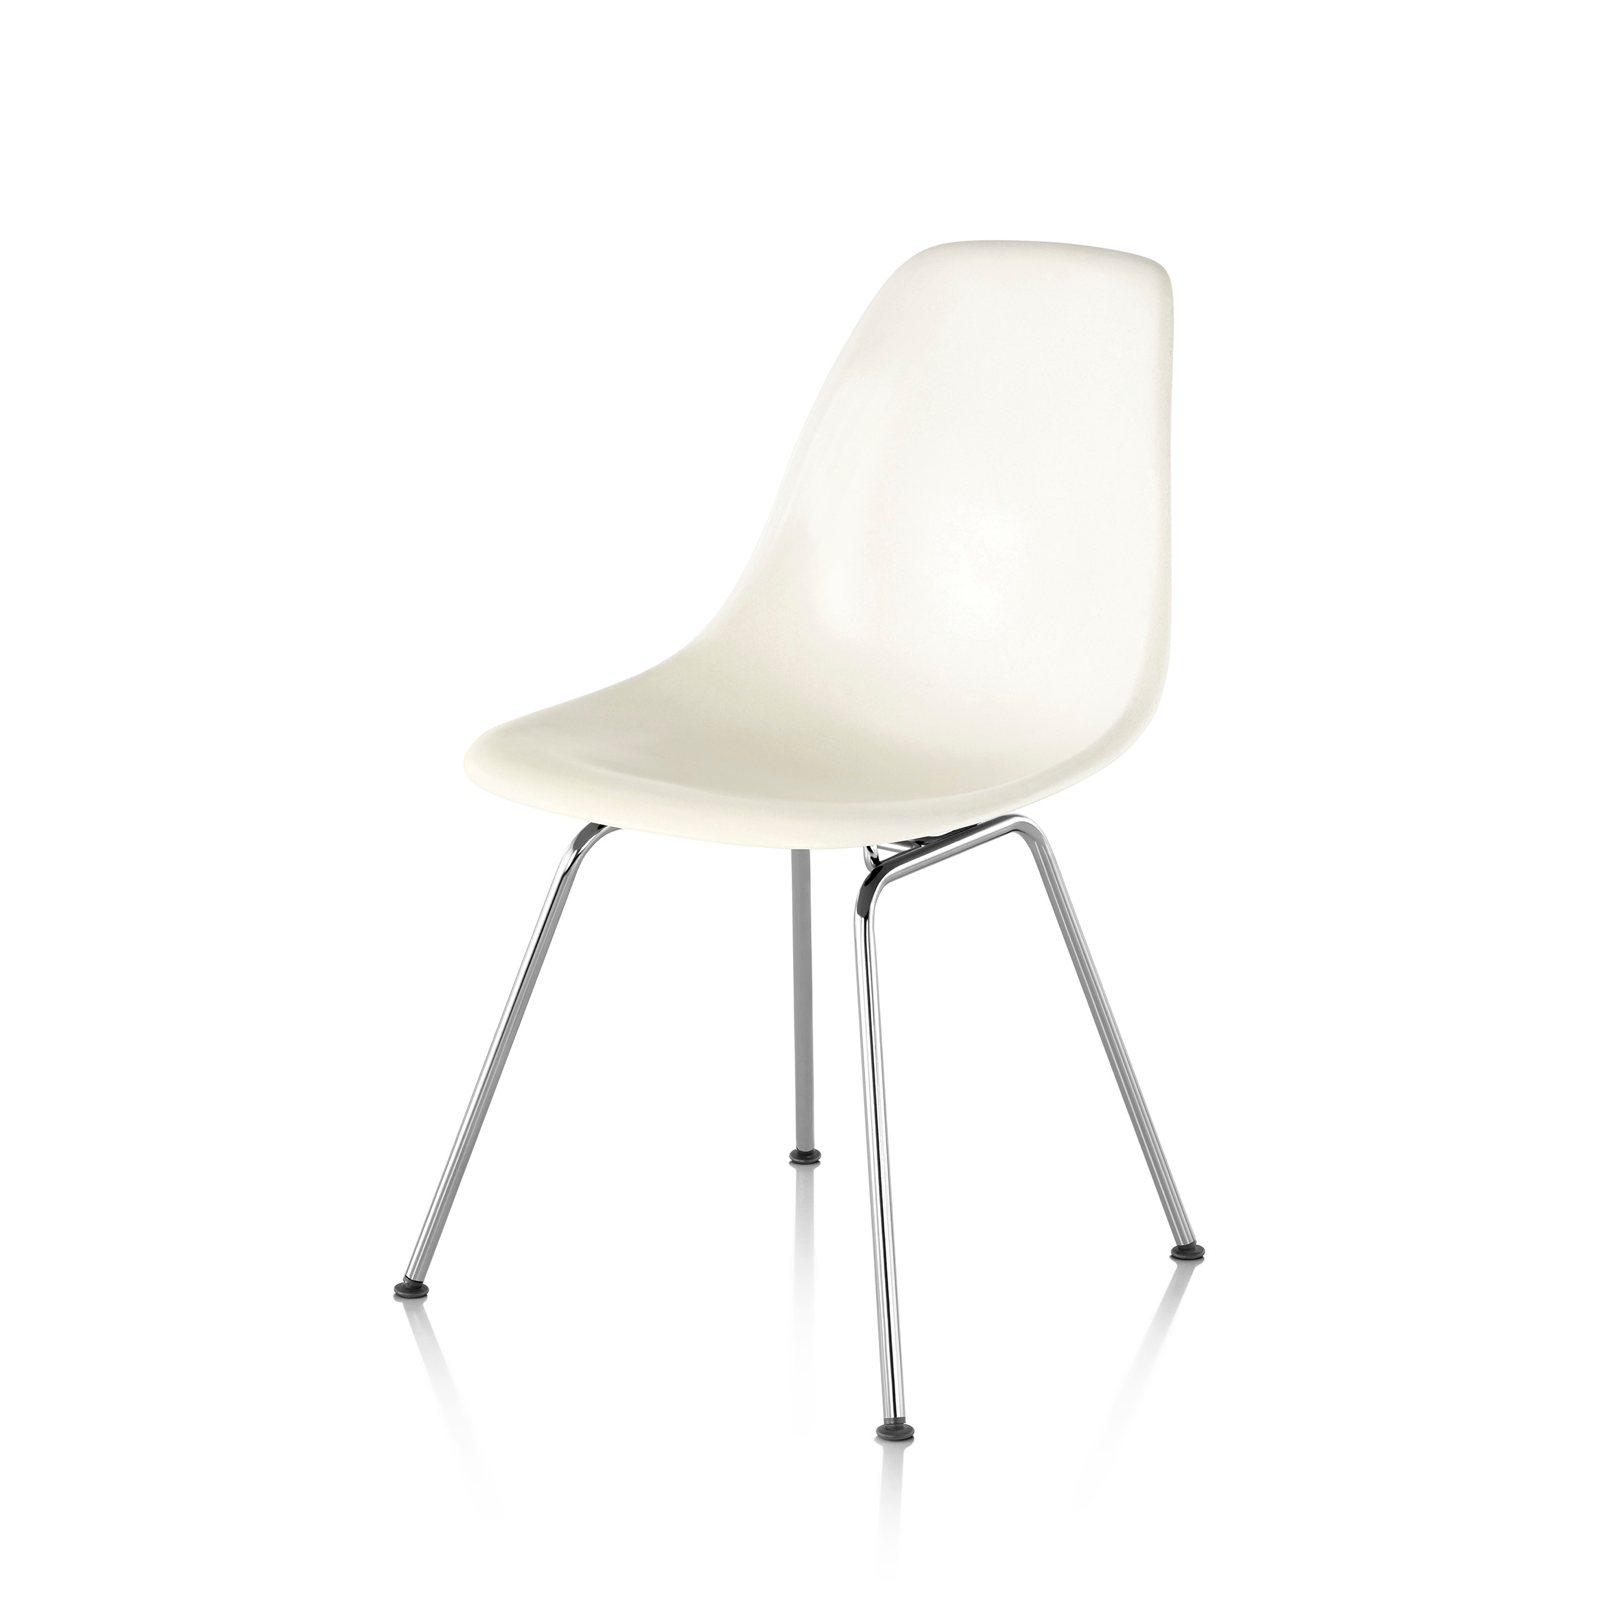 Eames Molded Plastic Side Chair 4 Leg Base, White.